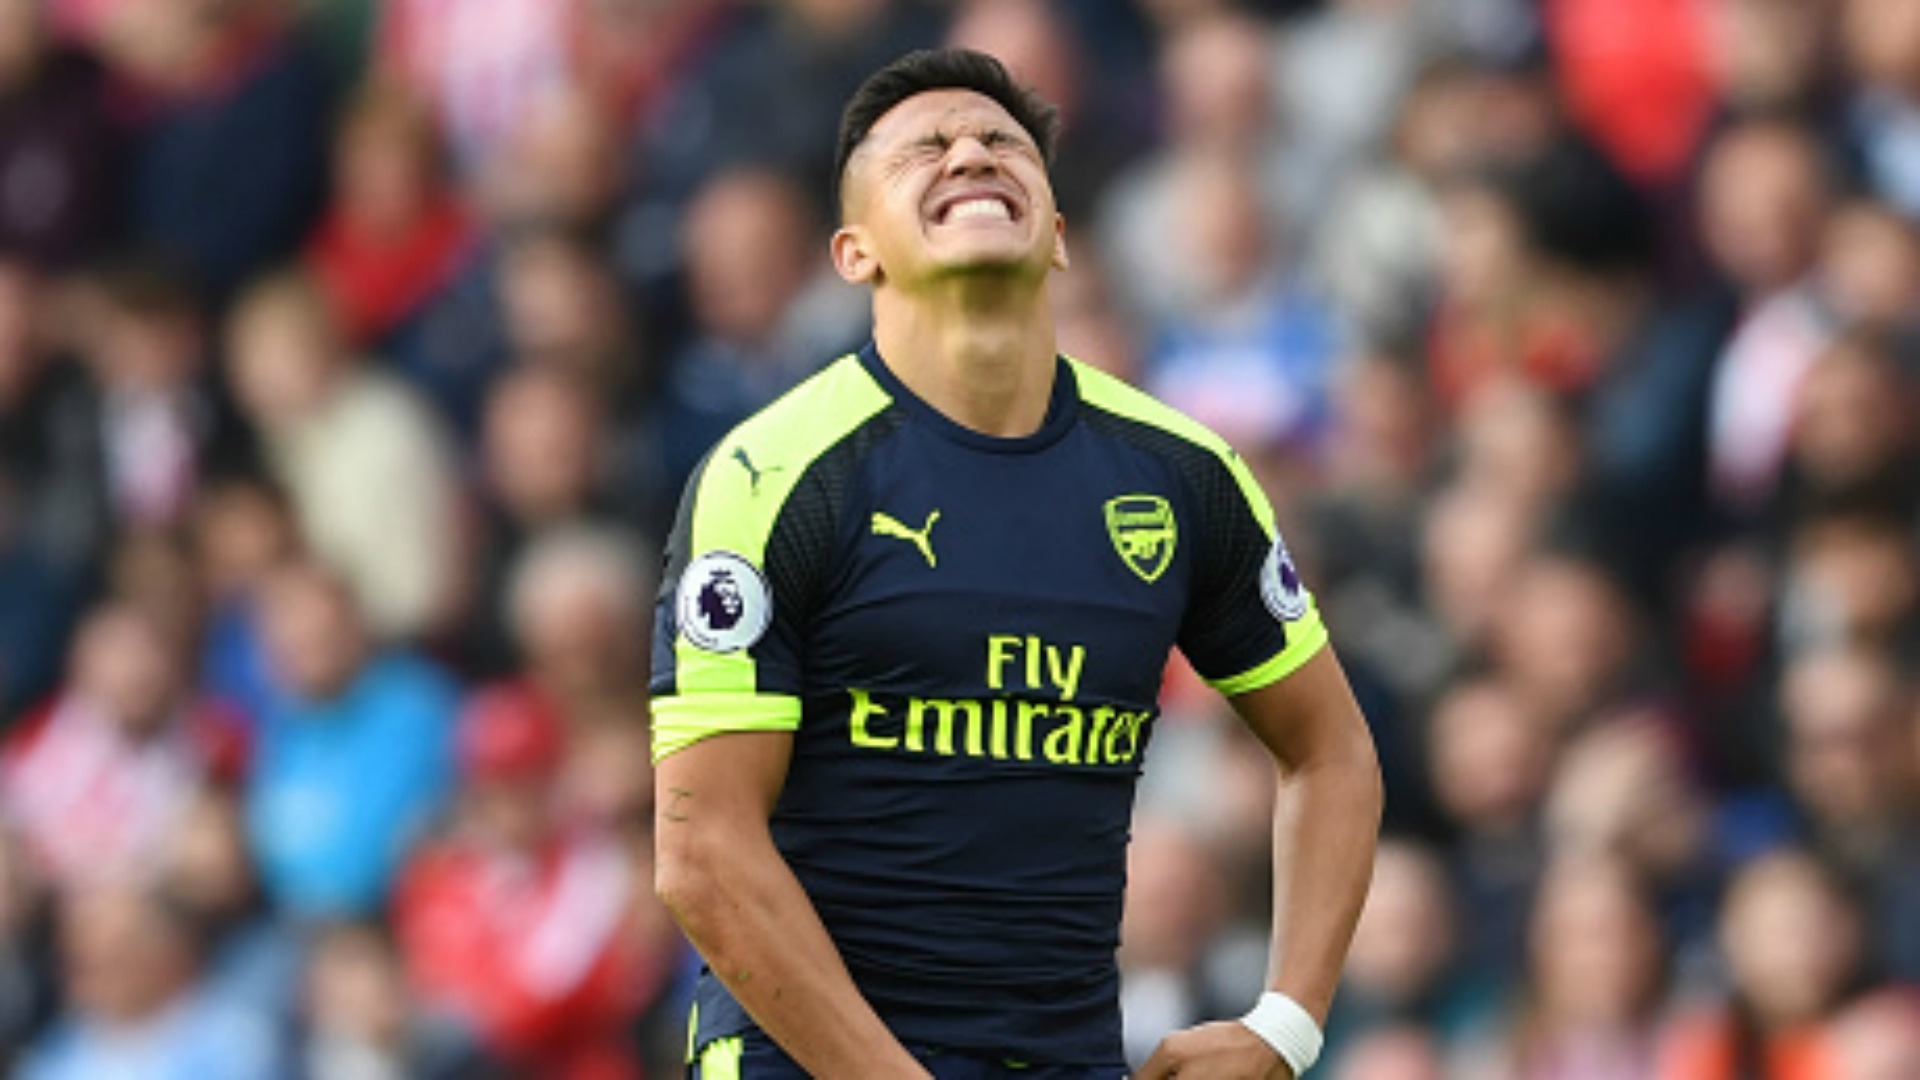 Alexis Sánchez mete miedo en Premier League